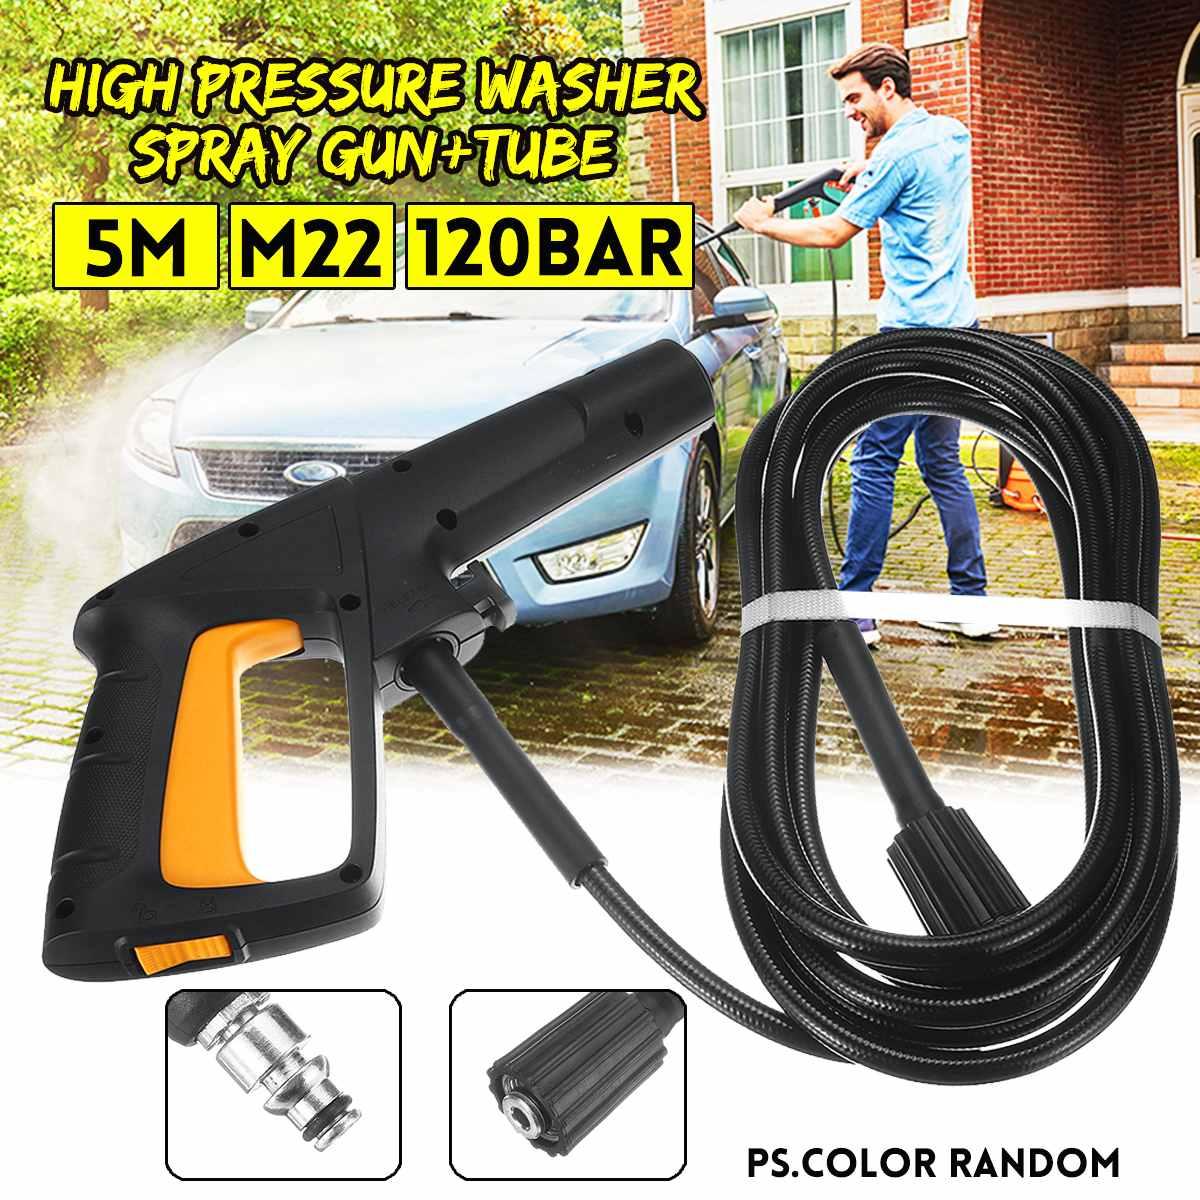 High Pressure Washer 5M M22 Spray Gun Tube Car Cleaning Tools Quickly 60 for LAVOR Machine Car Washer Pressure Gun Accessories